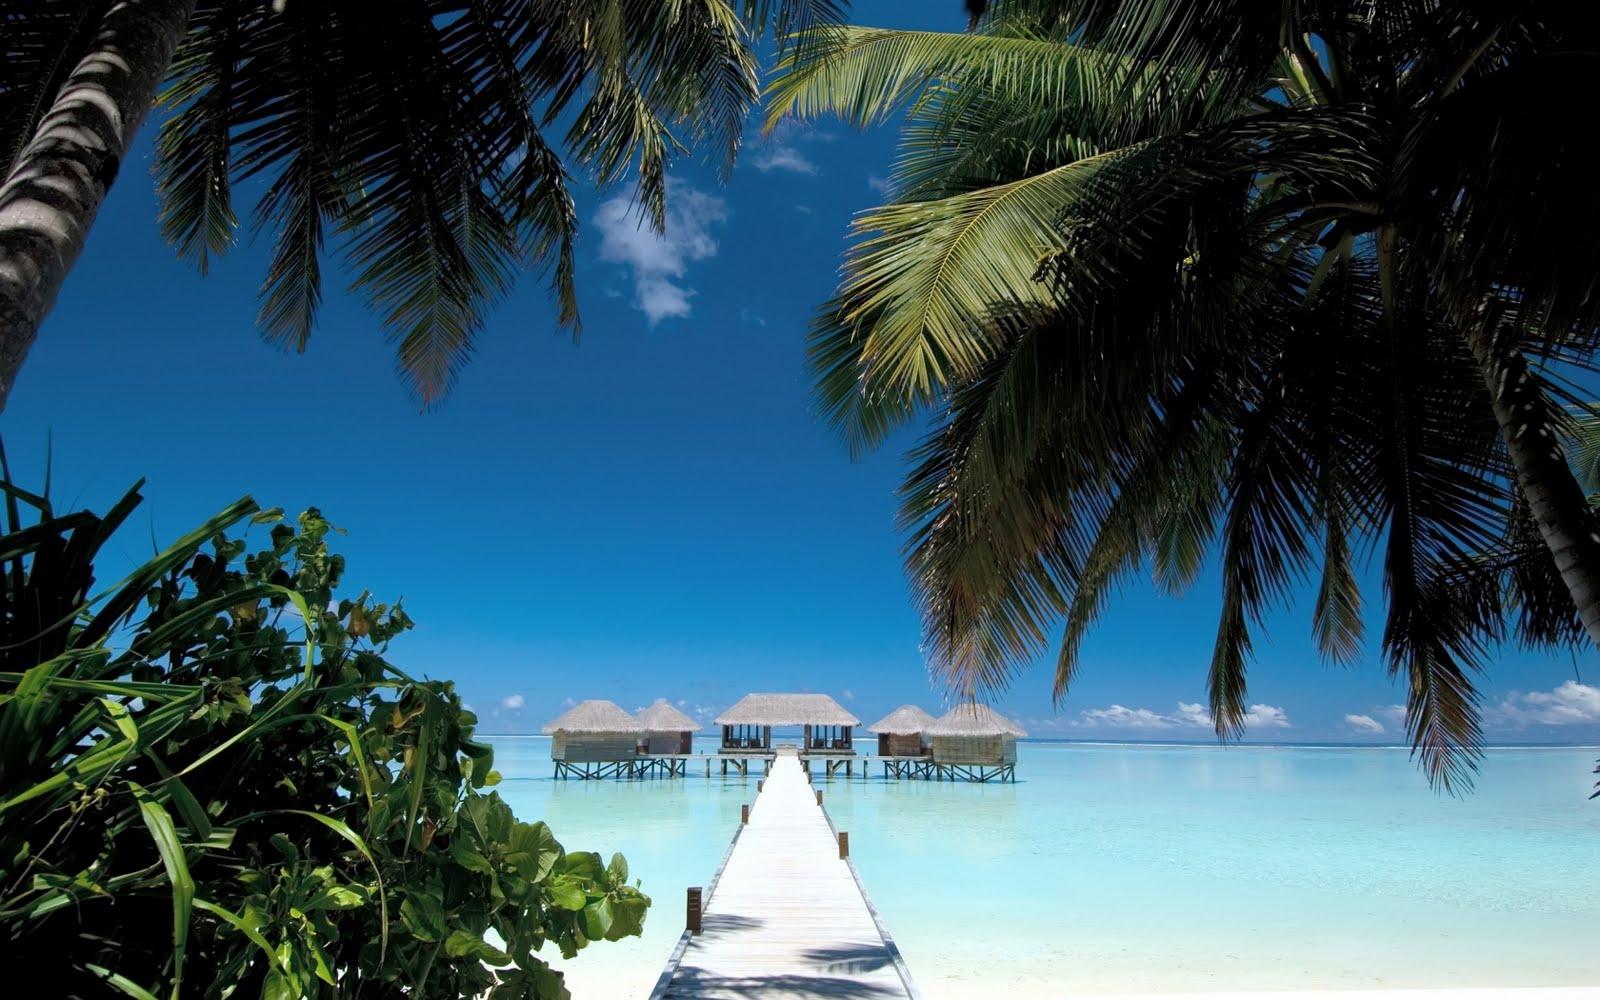 Maldives Islands - Desktop Backgrounds ~ Hd Desktop Wallpaper